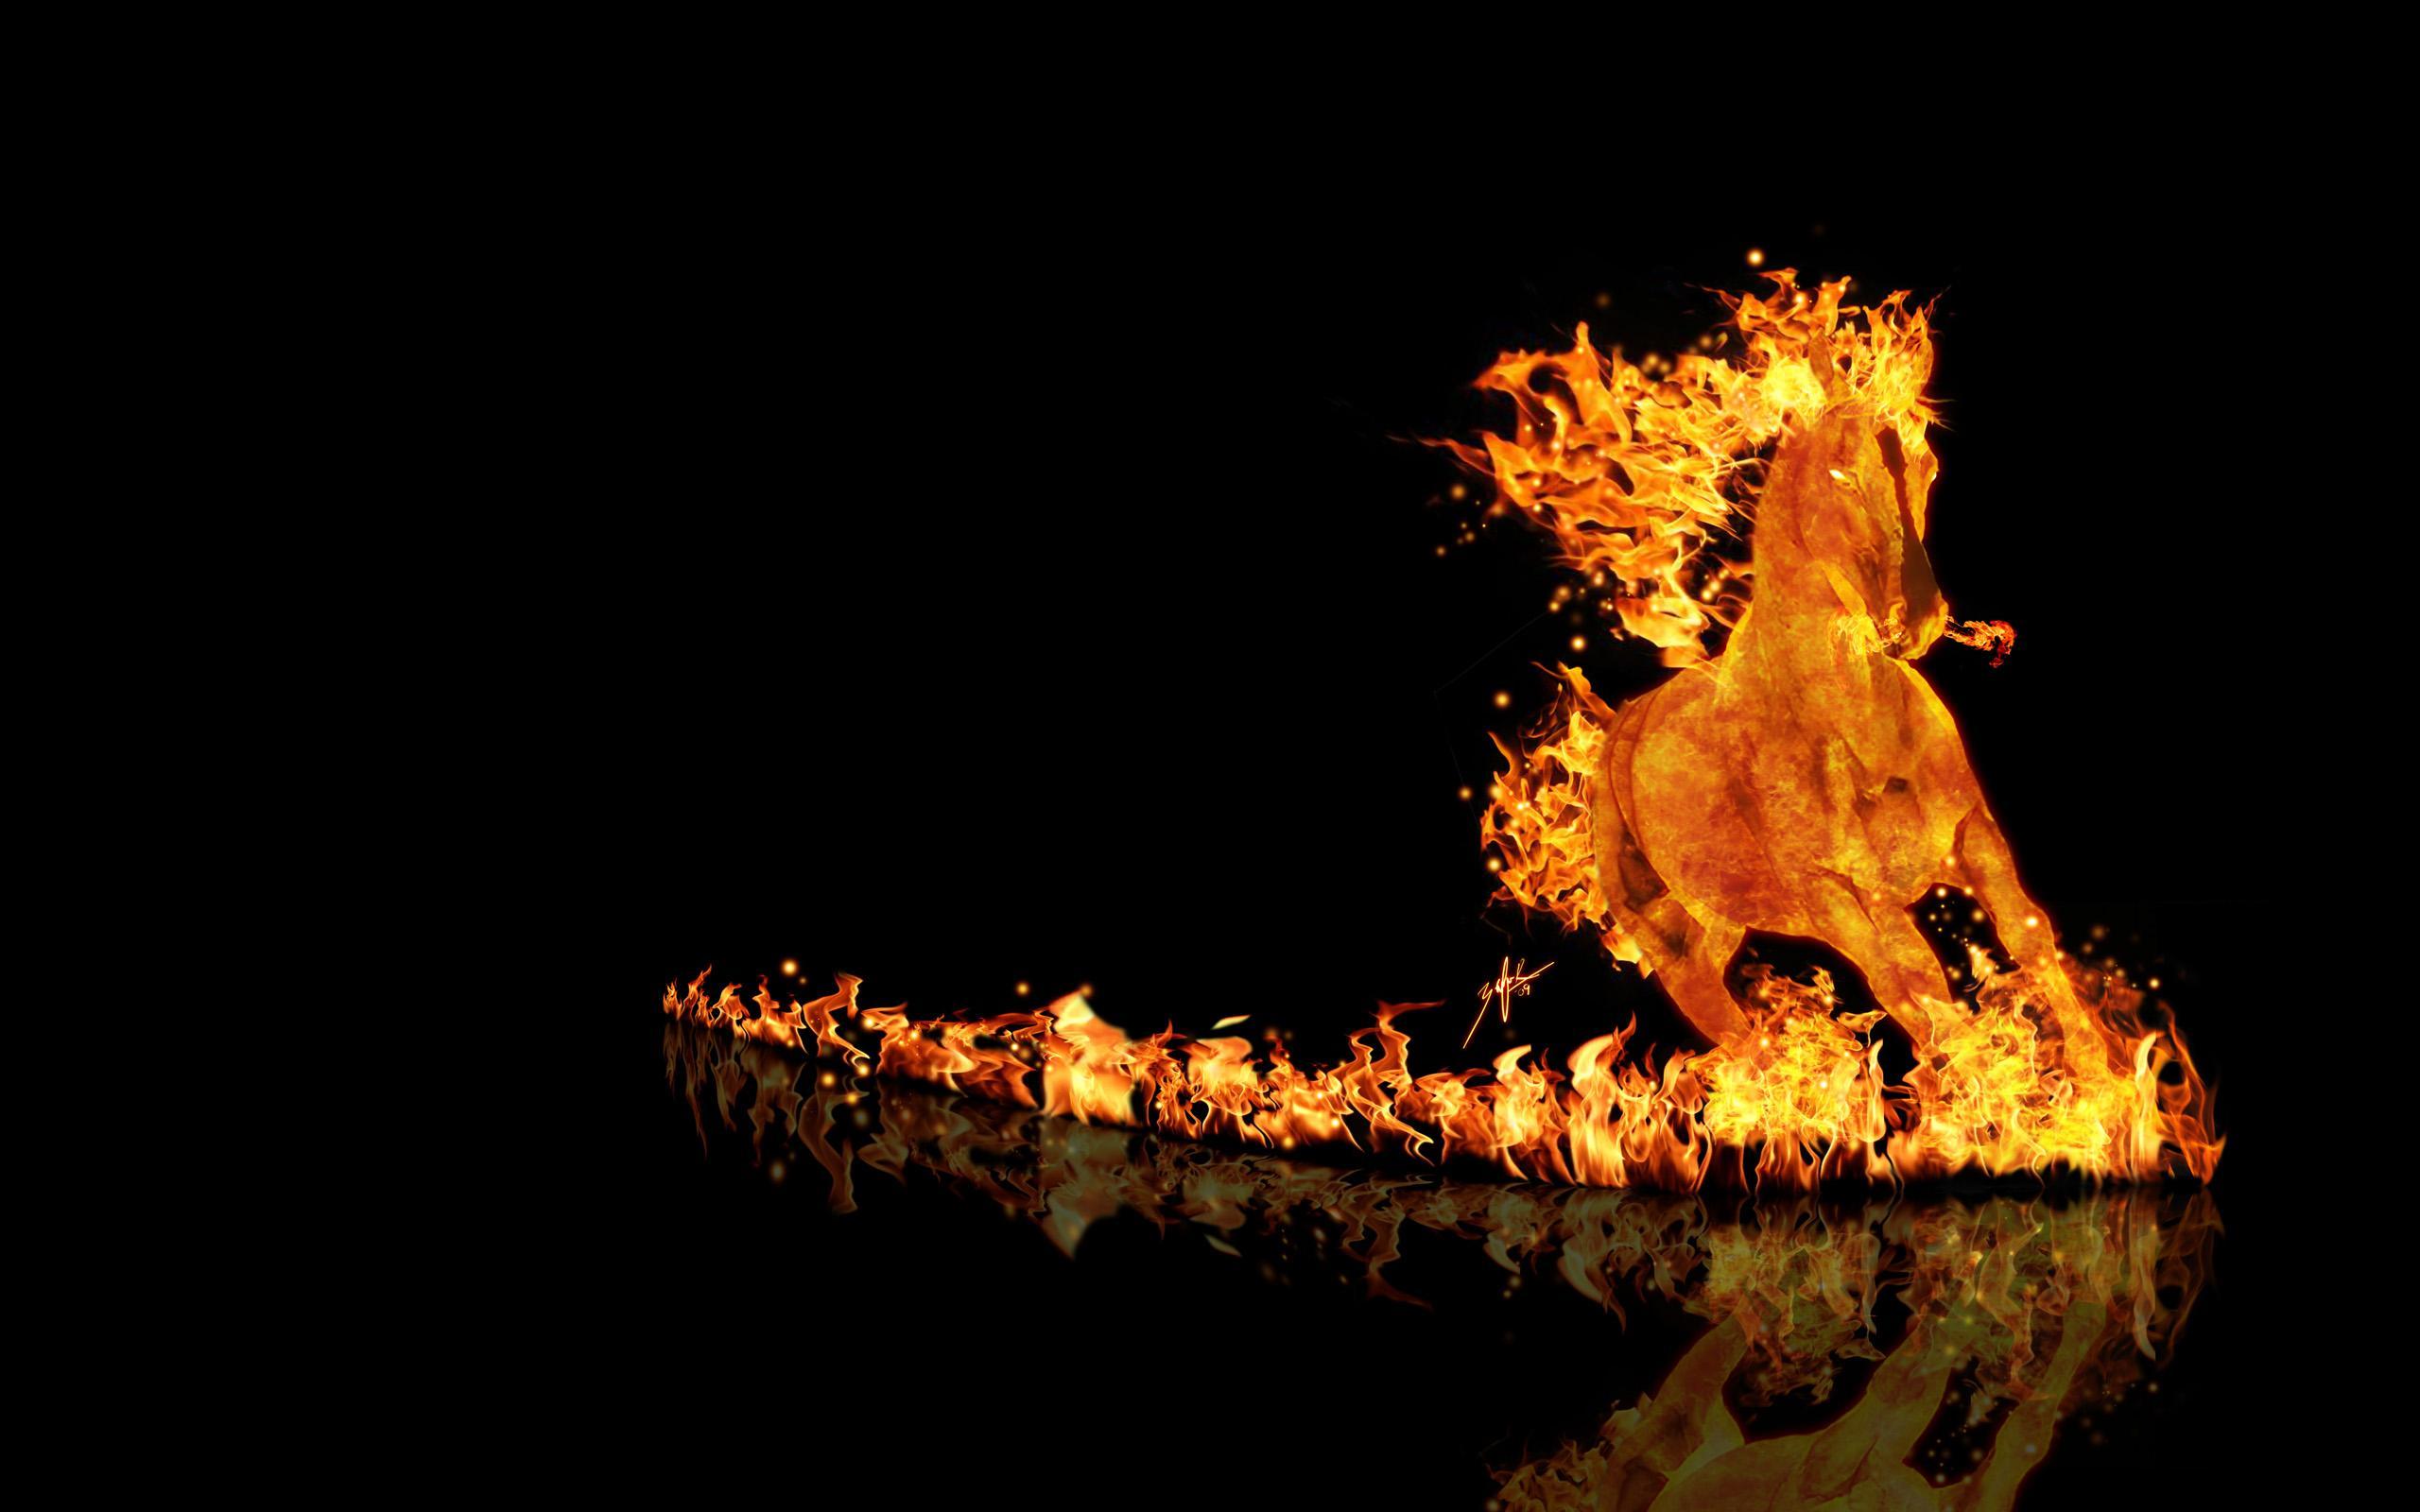 wallpaper   fire horse is a great wallpaper for your computer desktop 2560x1600